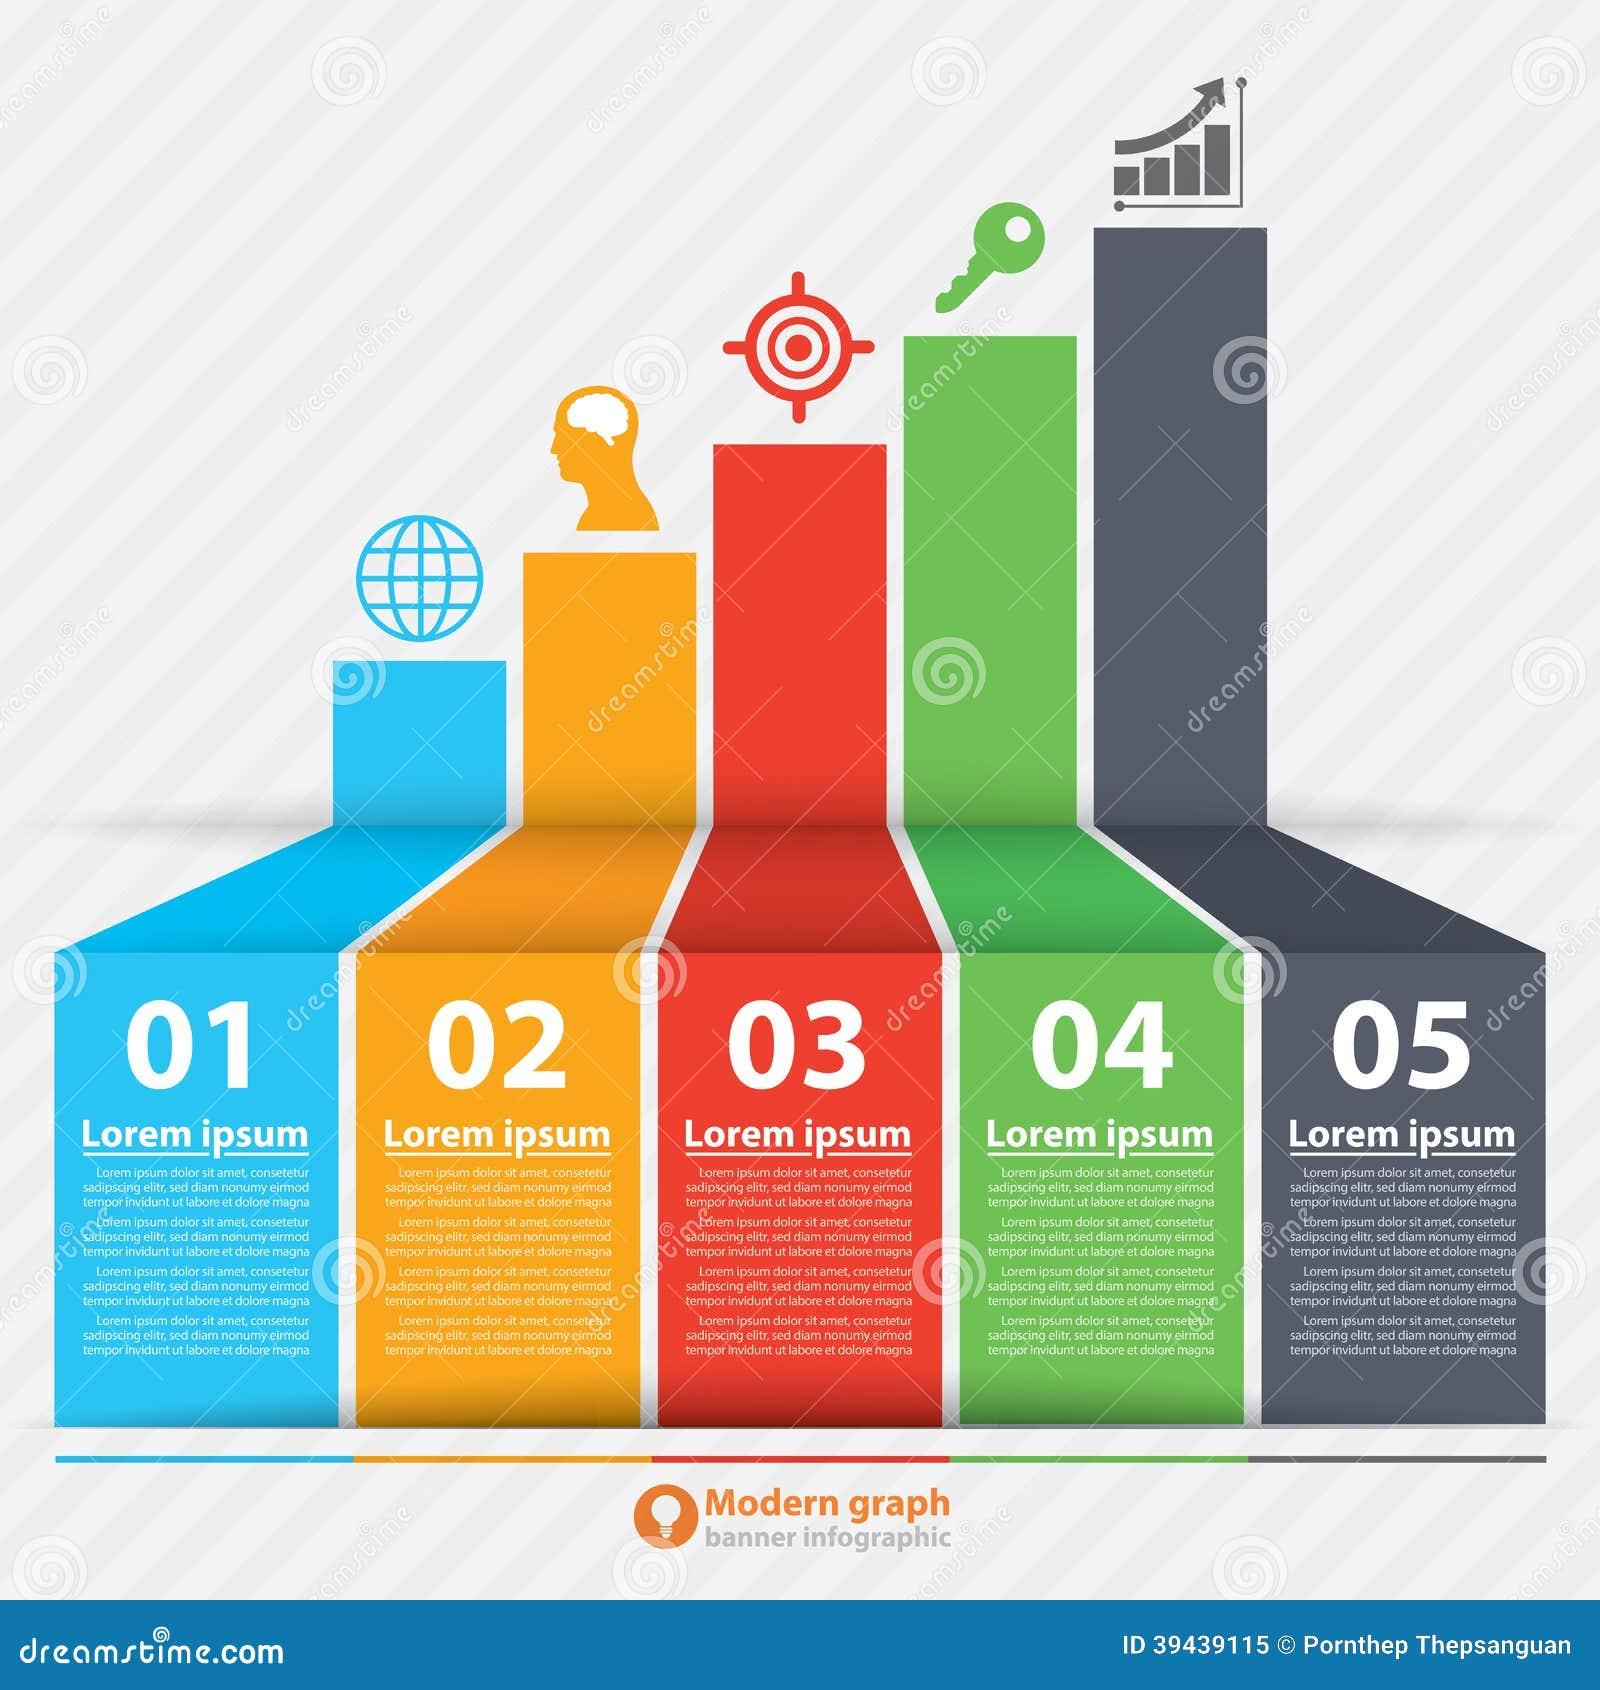 Vector Illustration Web Designs: Modern Graph Banner Infographic Stock Vector